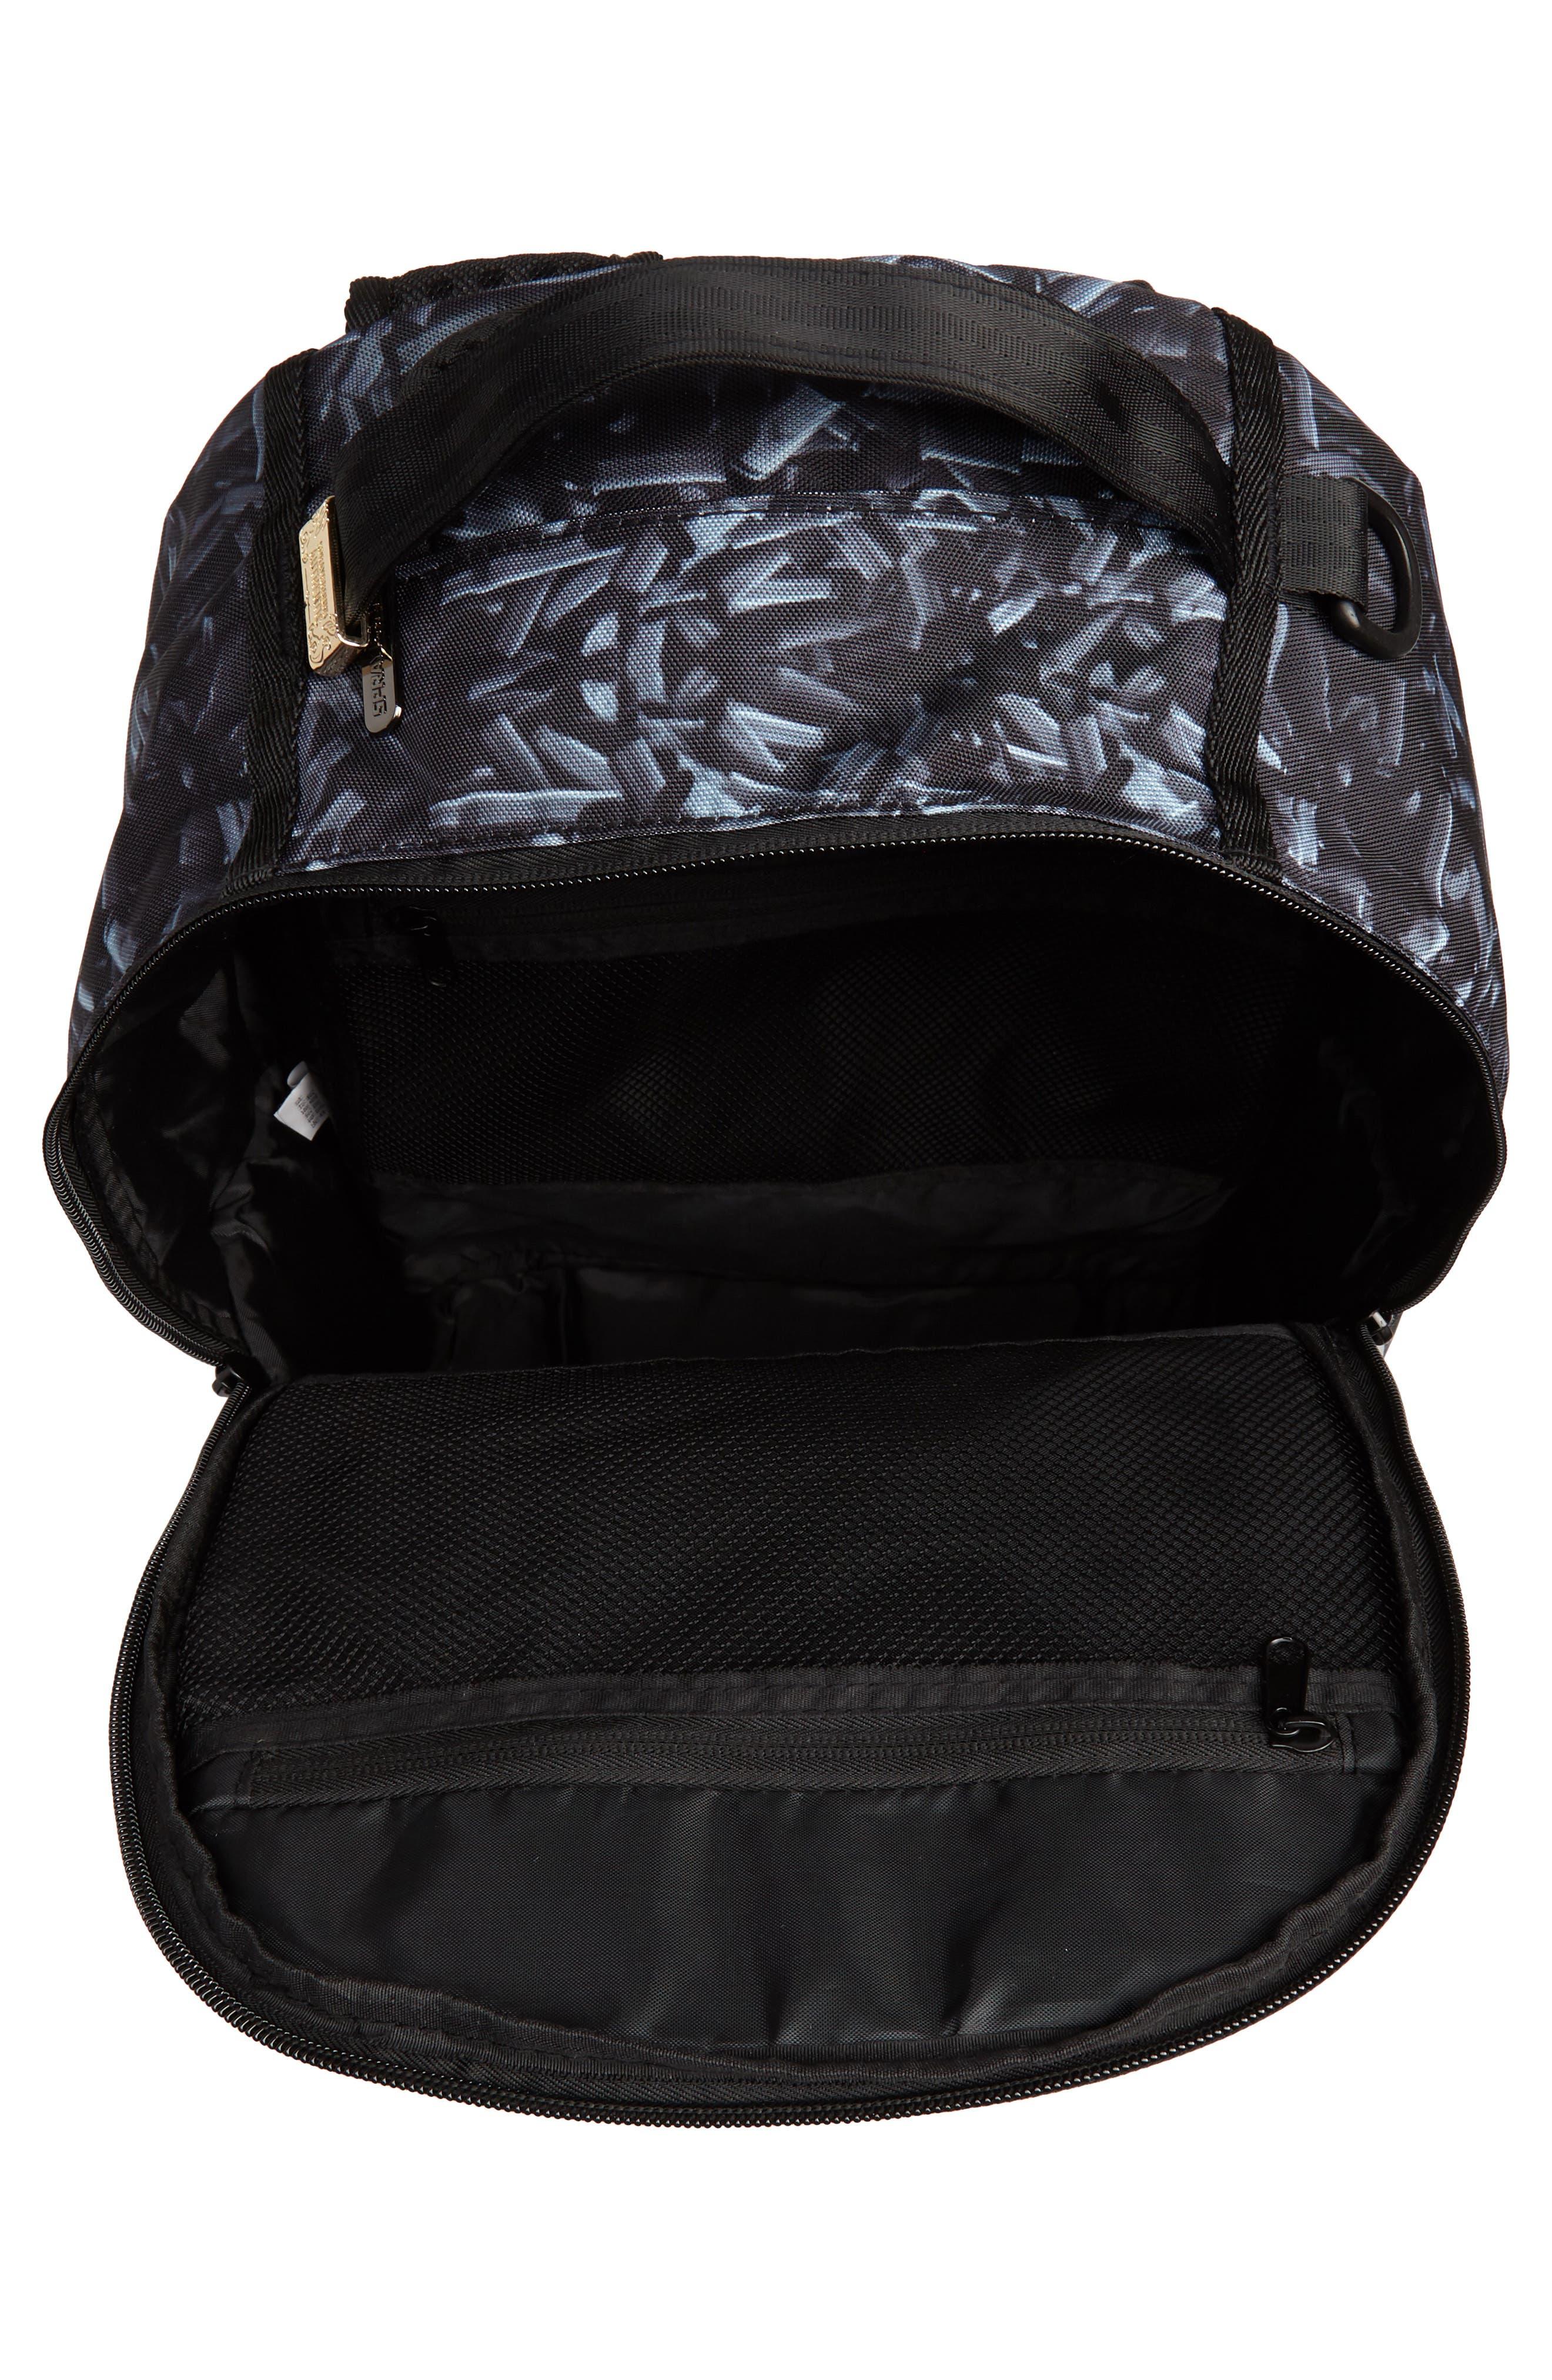 Deadpool Bullets Backpack,                             Alternate thumbnail 4, color,                             001